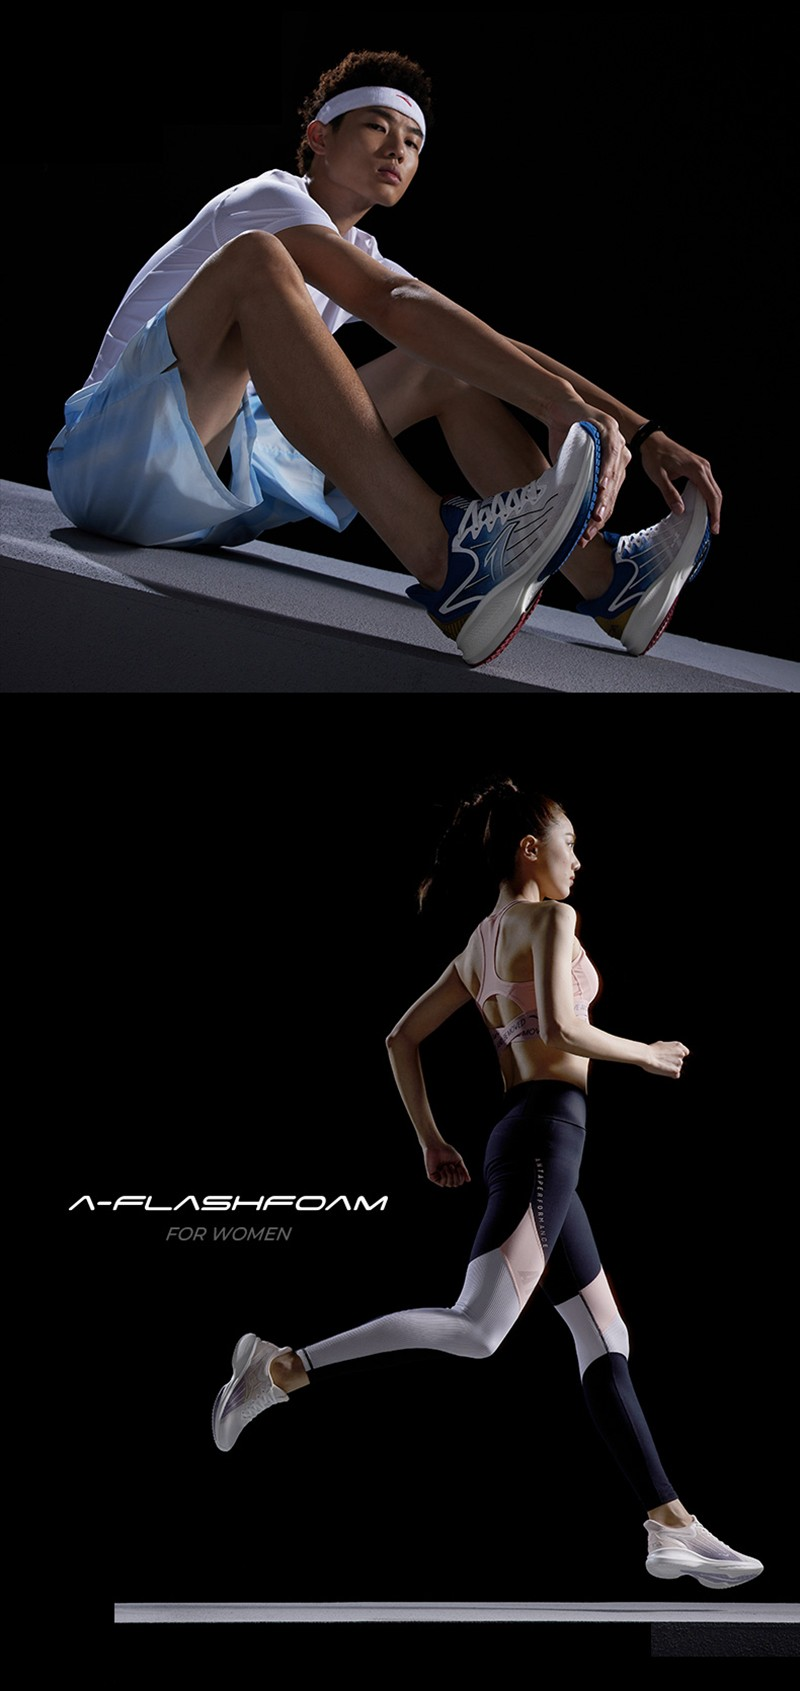 ANTA,安踏,羚跑,122125585-2  又轻又软!全新安踏「羚跑」跑鞋即将发售!